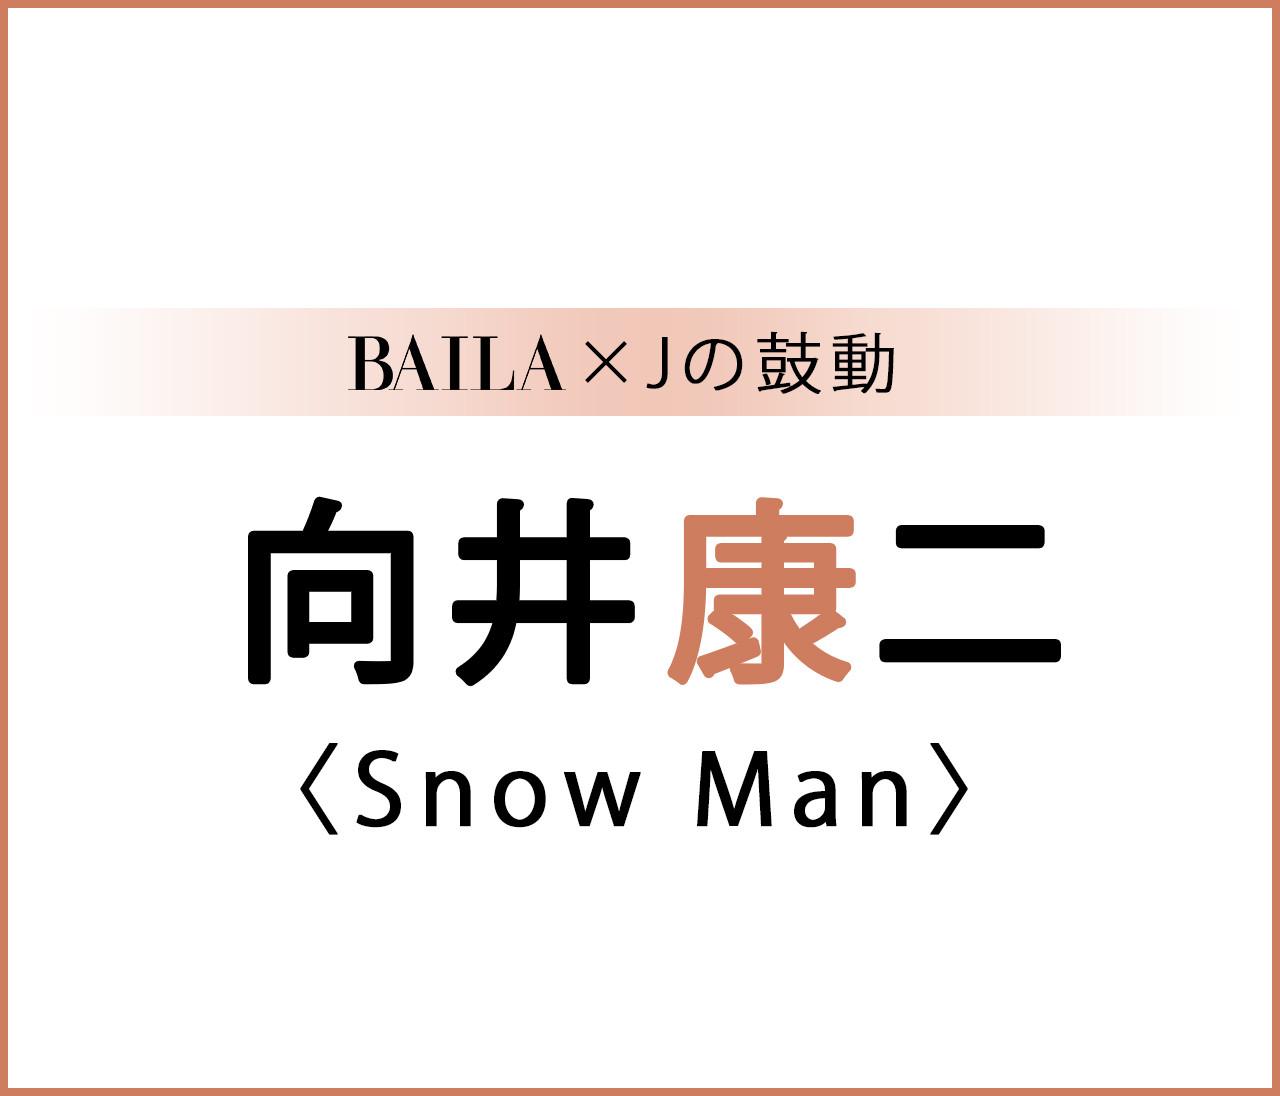 【 #SnowMan #向井康二 】向井康二スペシャルインタビュー!【BAILA × Jの鼓動】